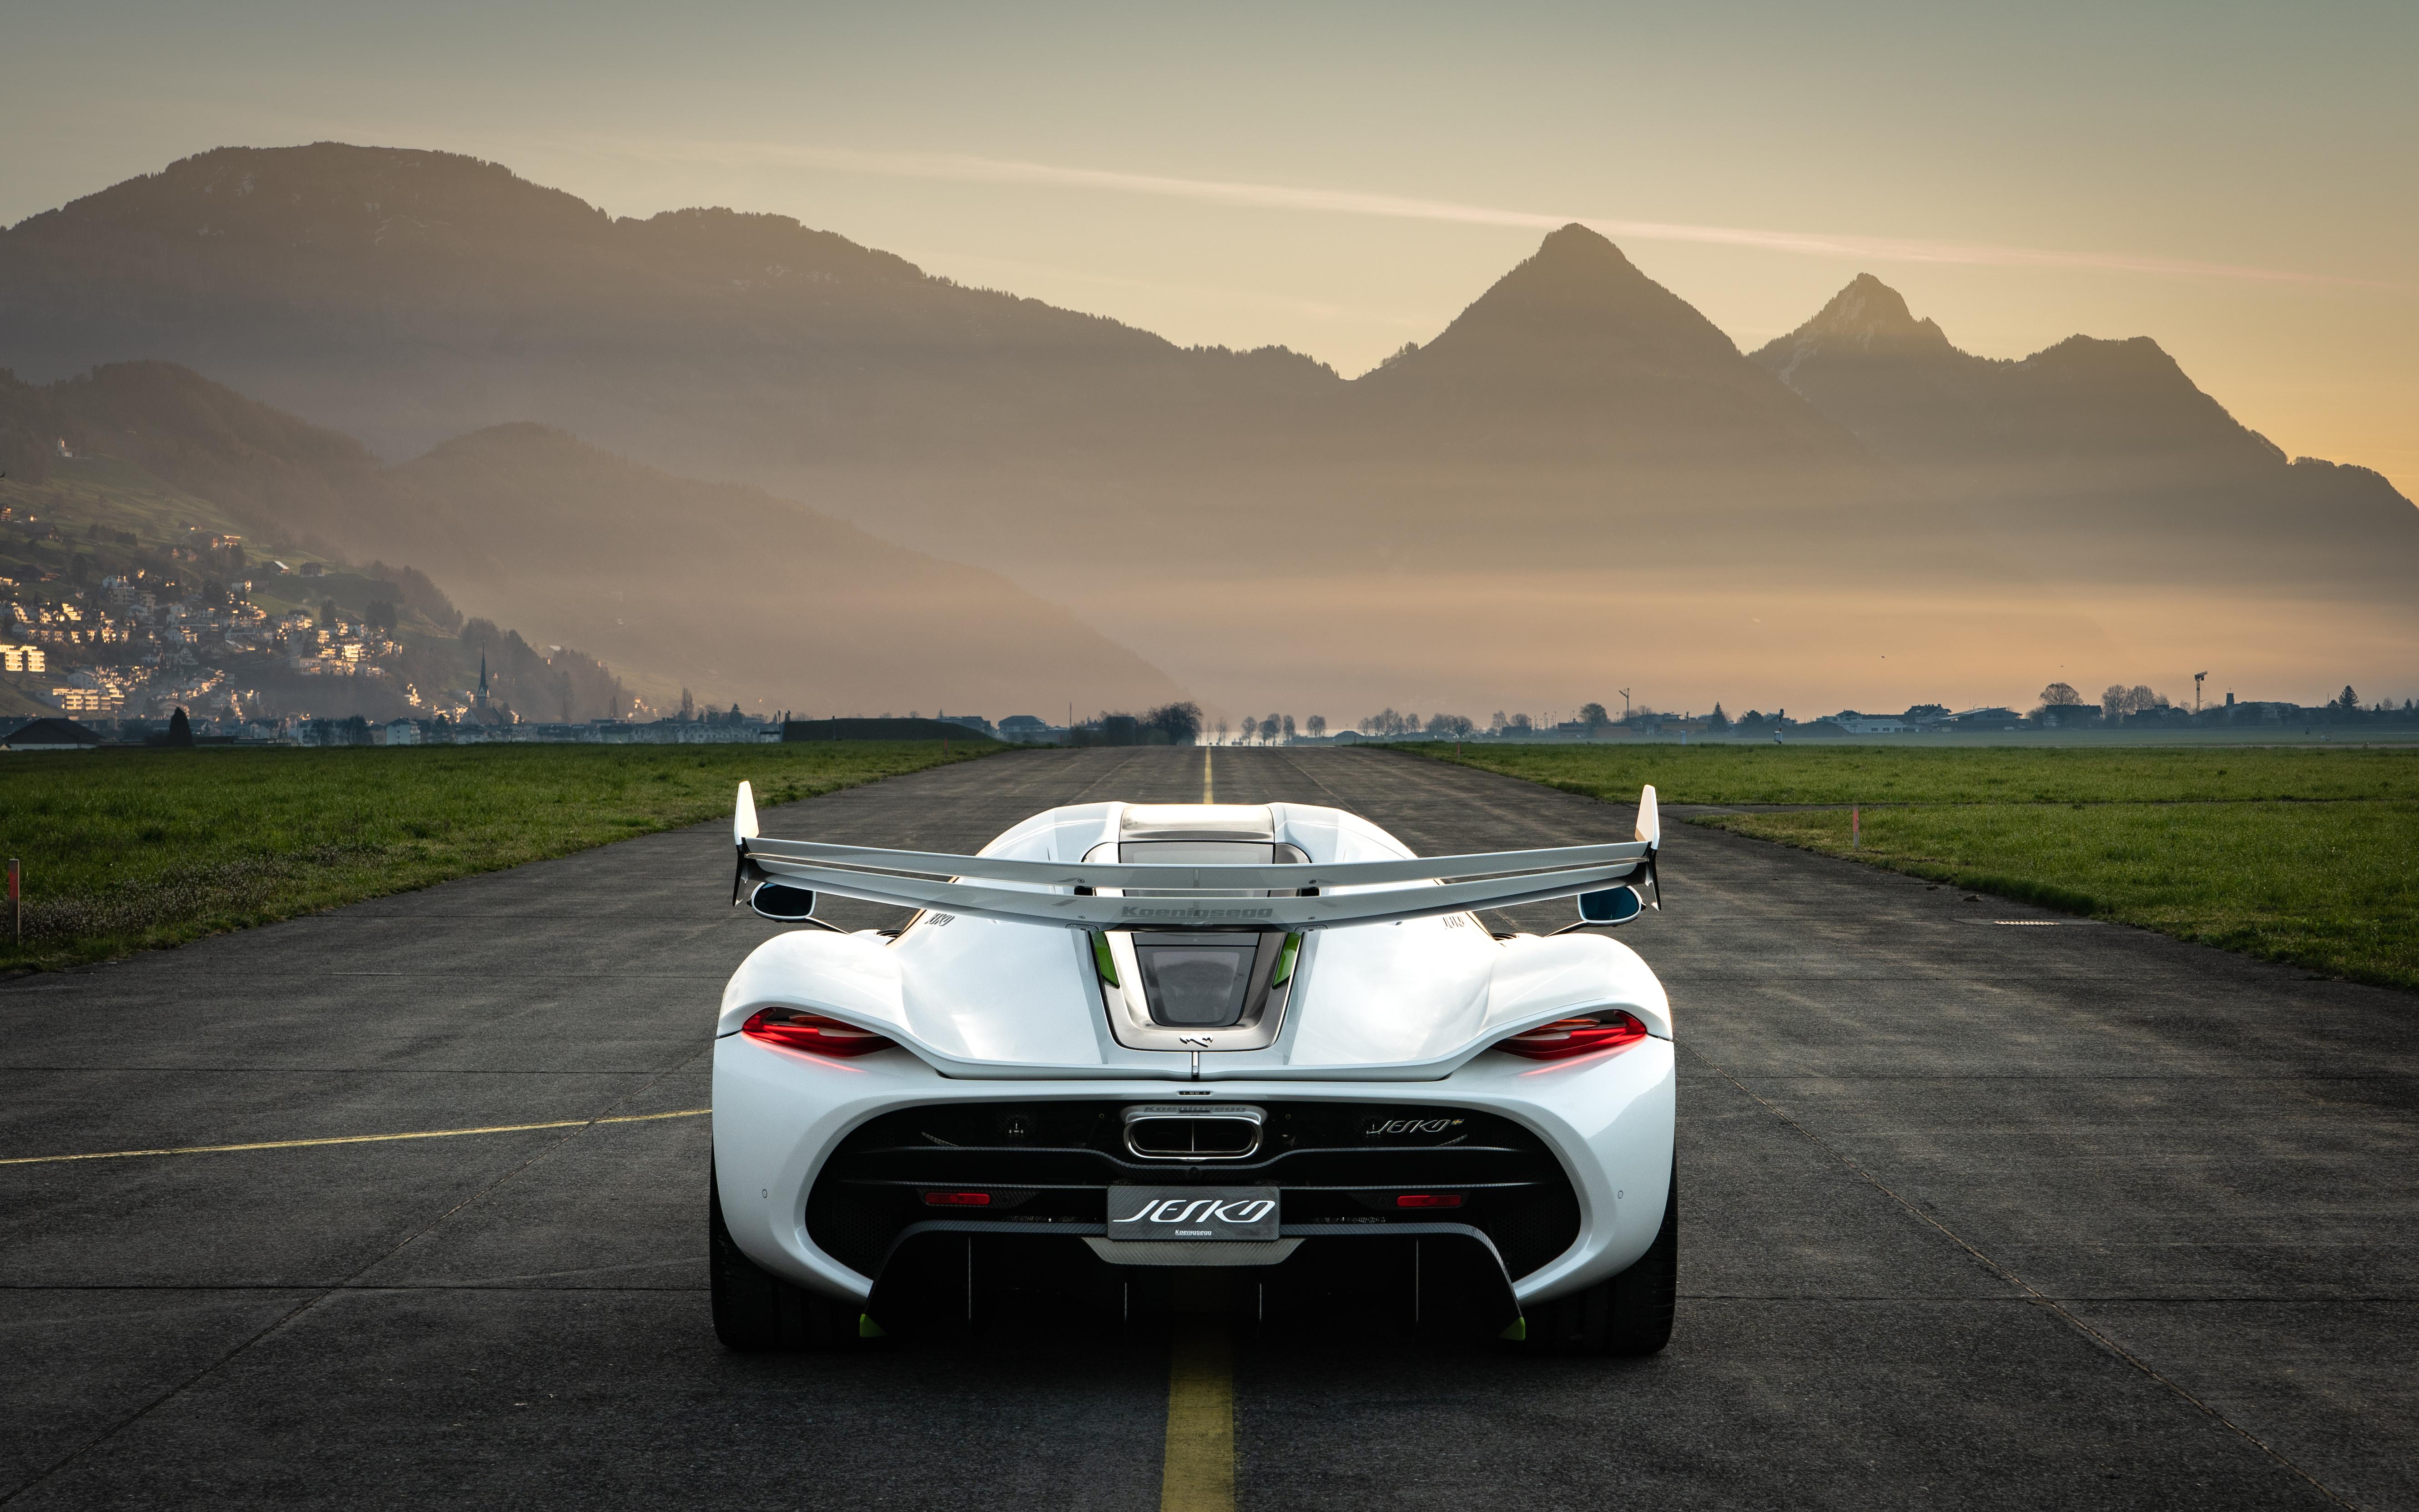 2019 Koenigsegg Jesko Rear, HD Cars, 4k Wallpapers, Images ...